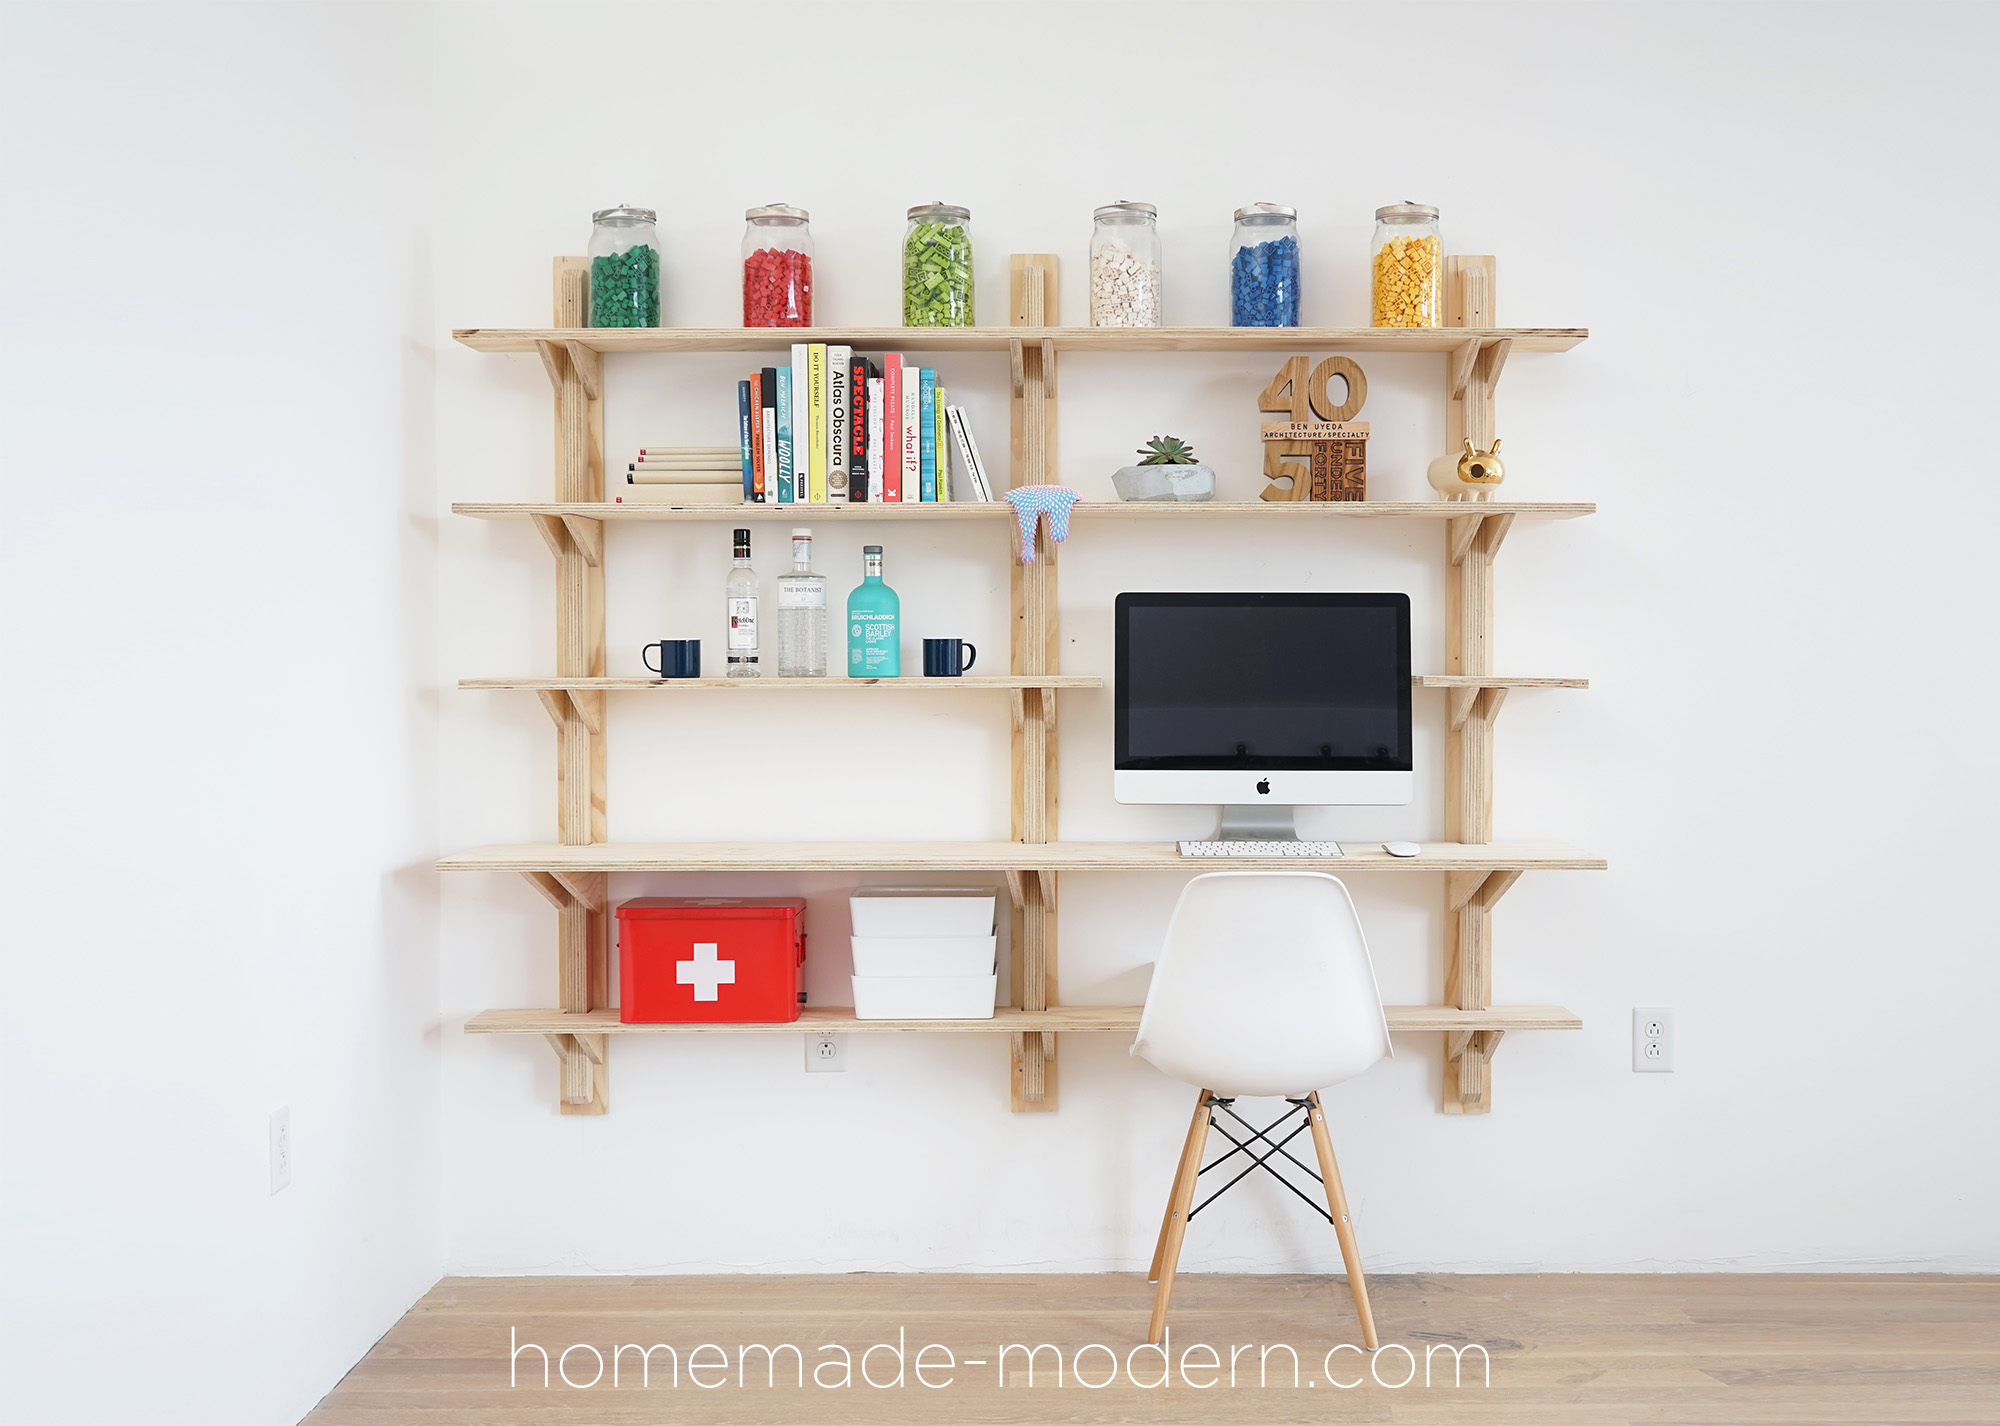 Homemade Modern Ep118 Diy Plywood Shelves With Smart Home Tech